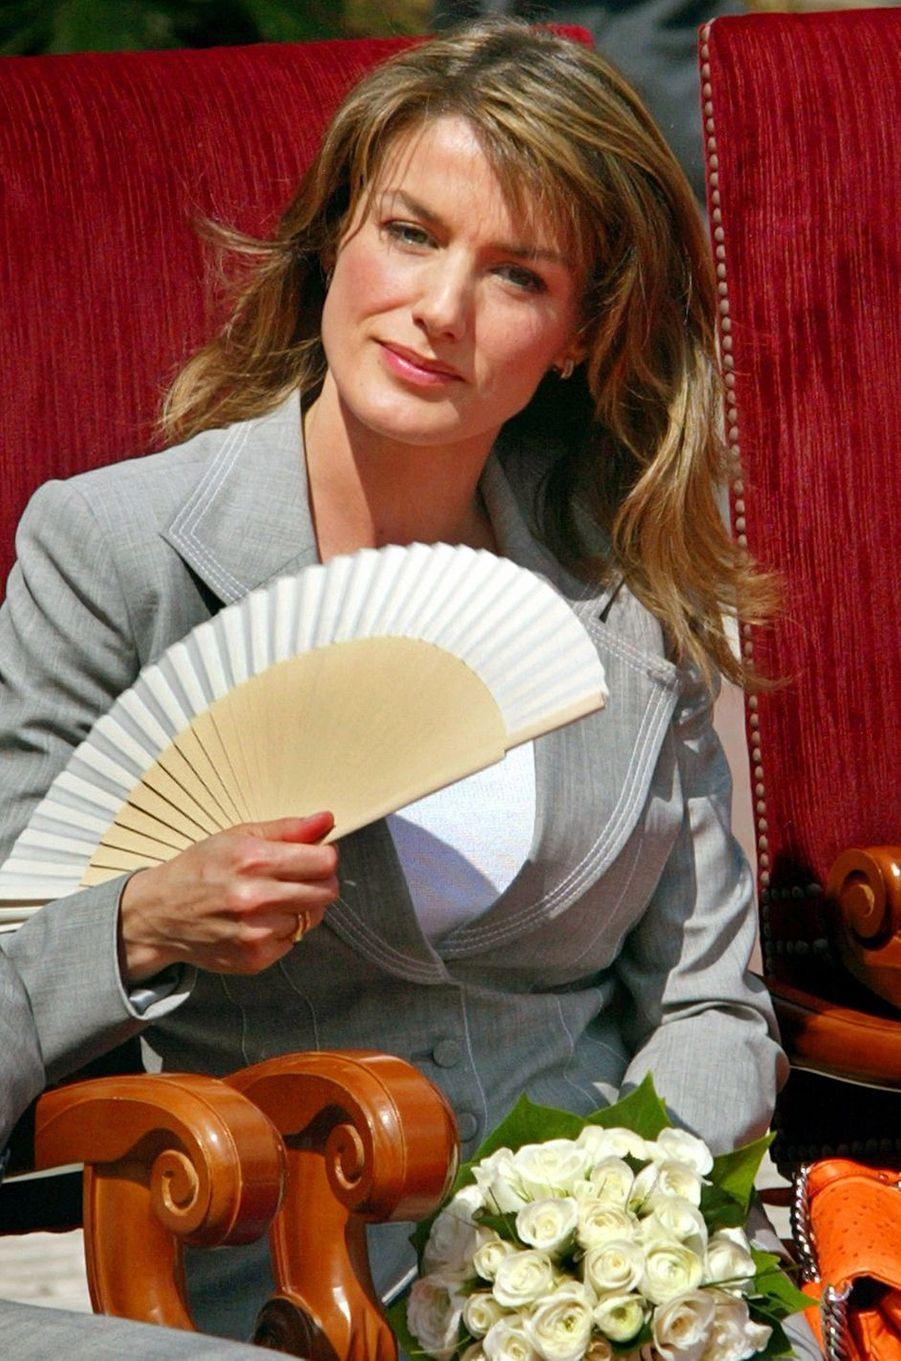 La princesse Letizia d'Espagne, le 12 mai 2005